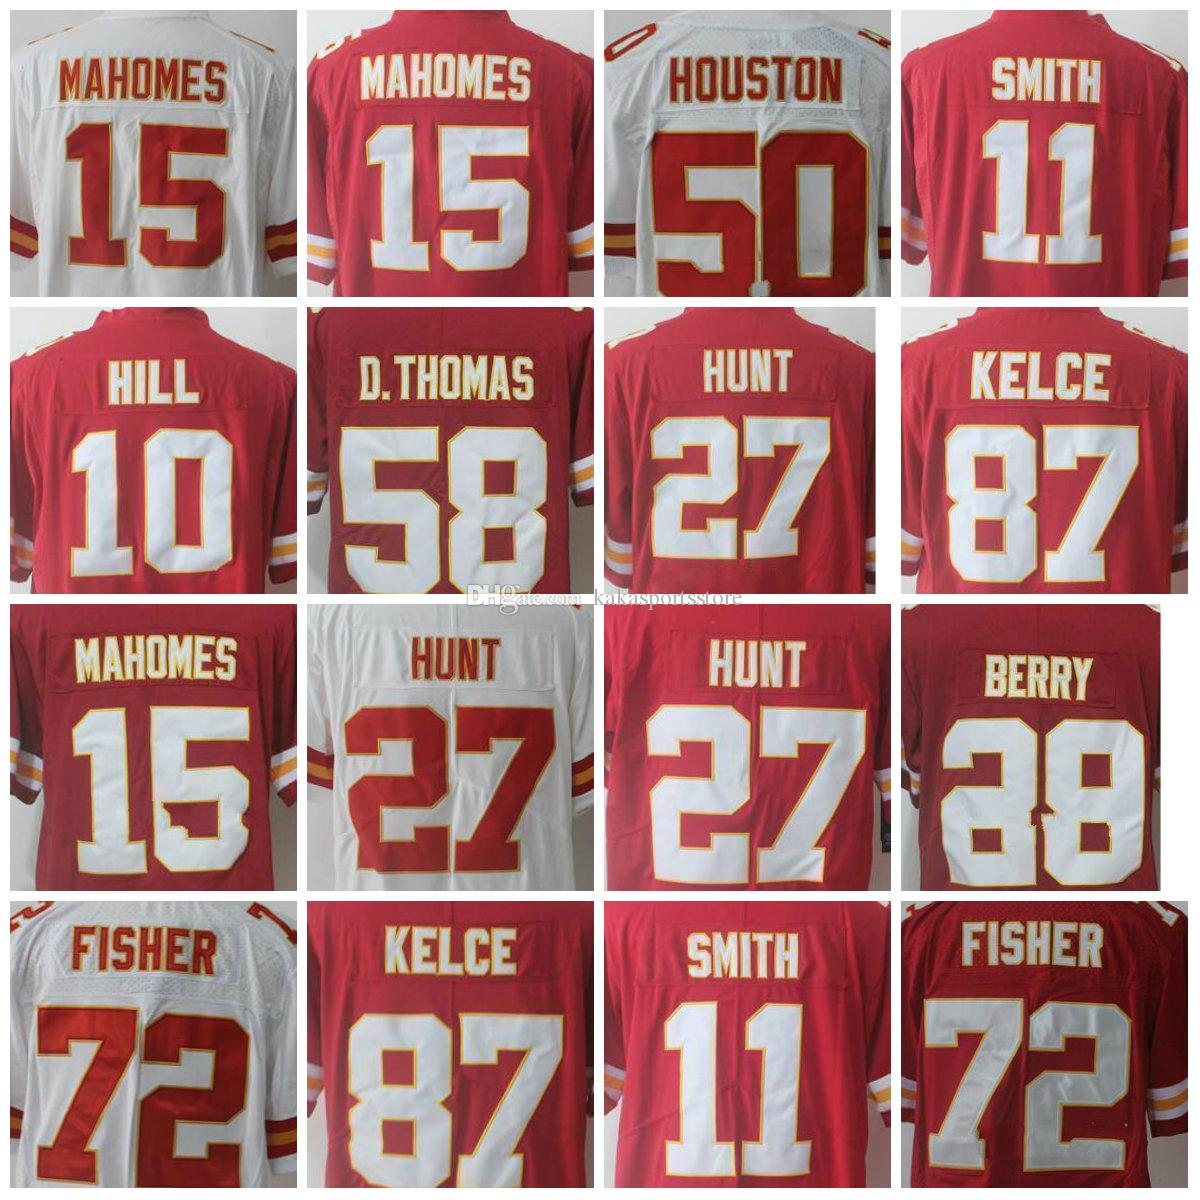 c9b72dab0f6 ... 10 Tyreek Hill 27 Kareem httpwww.sunshinesportskits.com NFL Kansas City  Chiefs Jerseys Pinterest Httpwww.jennisonbeautysupply.com 2017 MenS 50  Justin ...